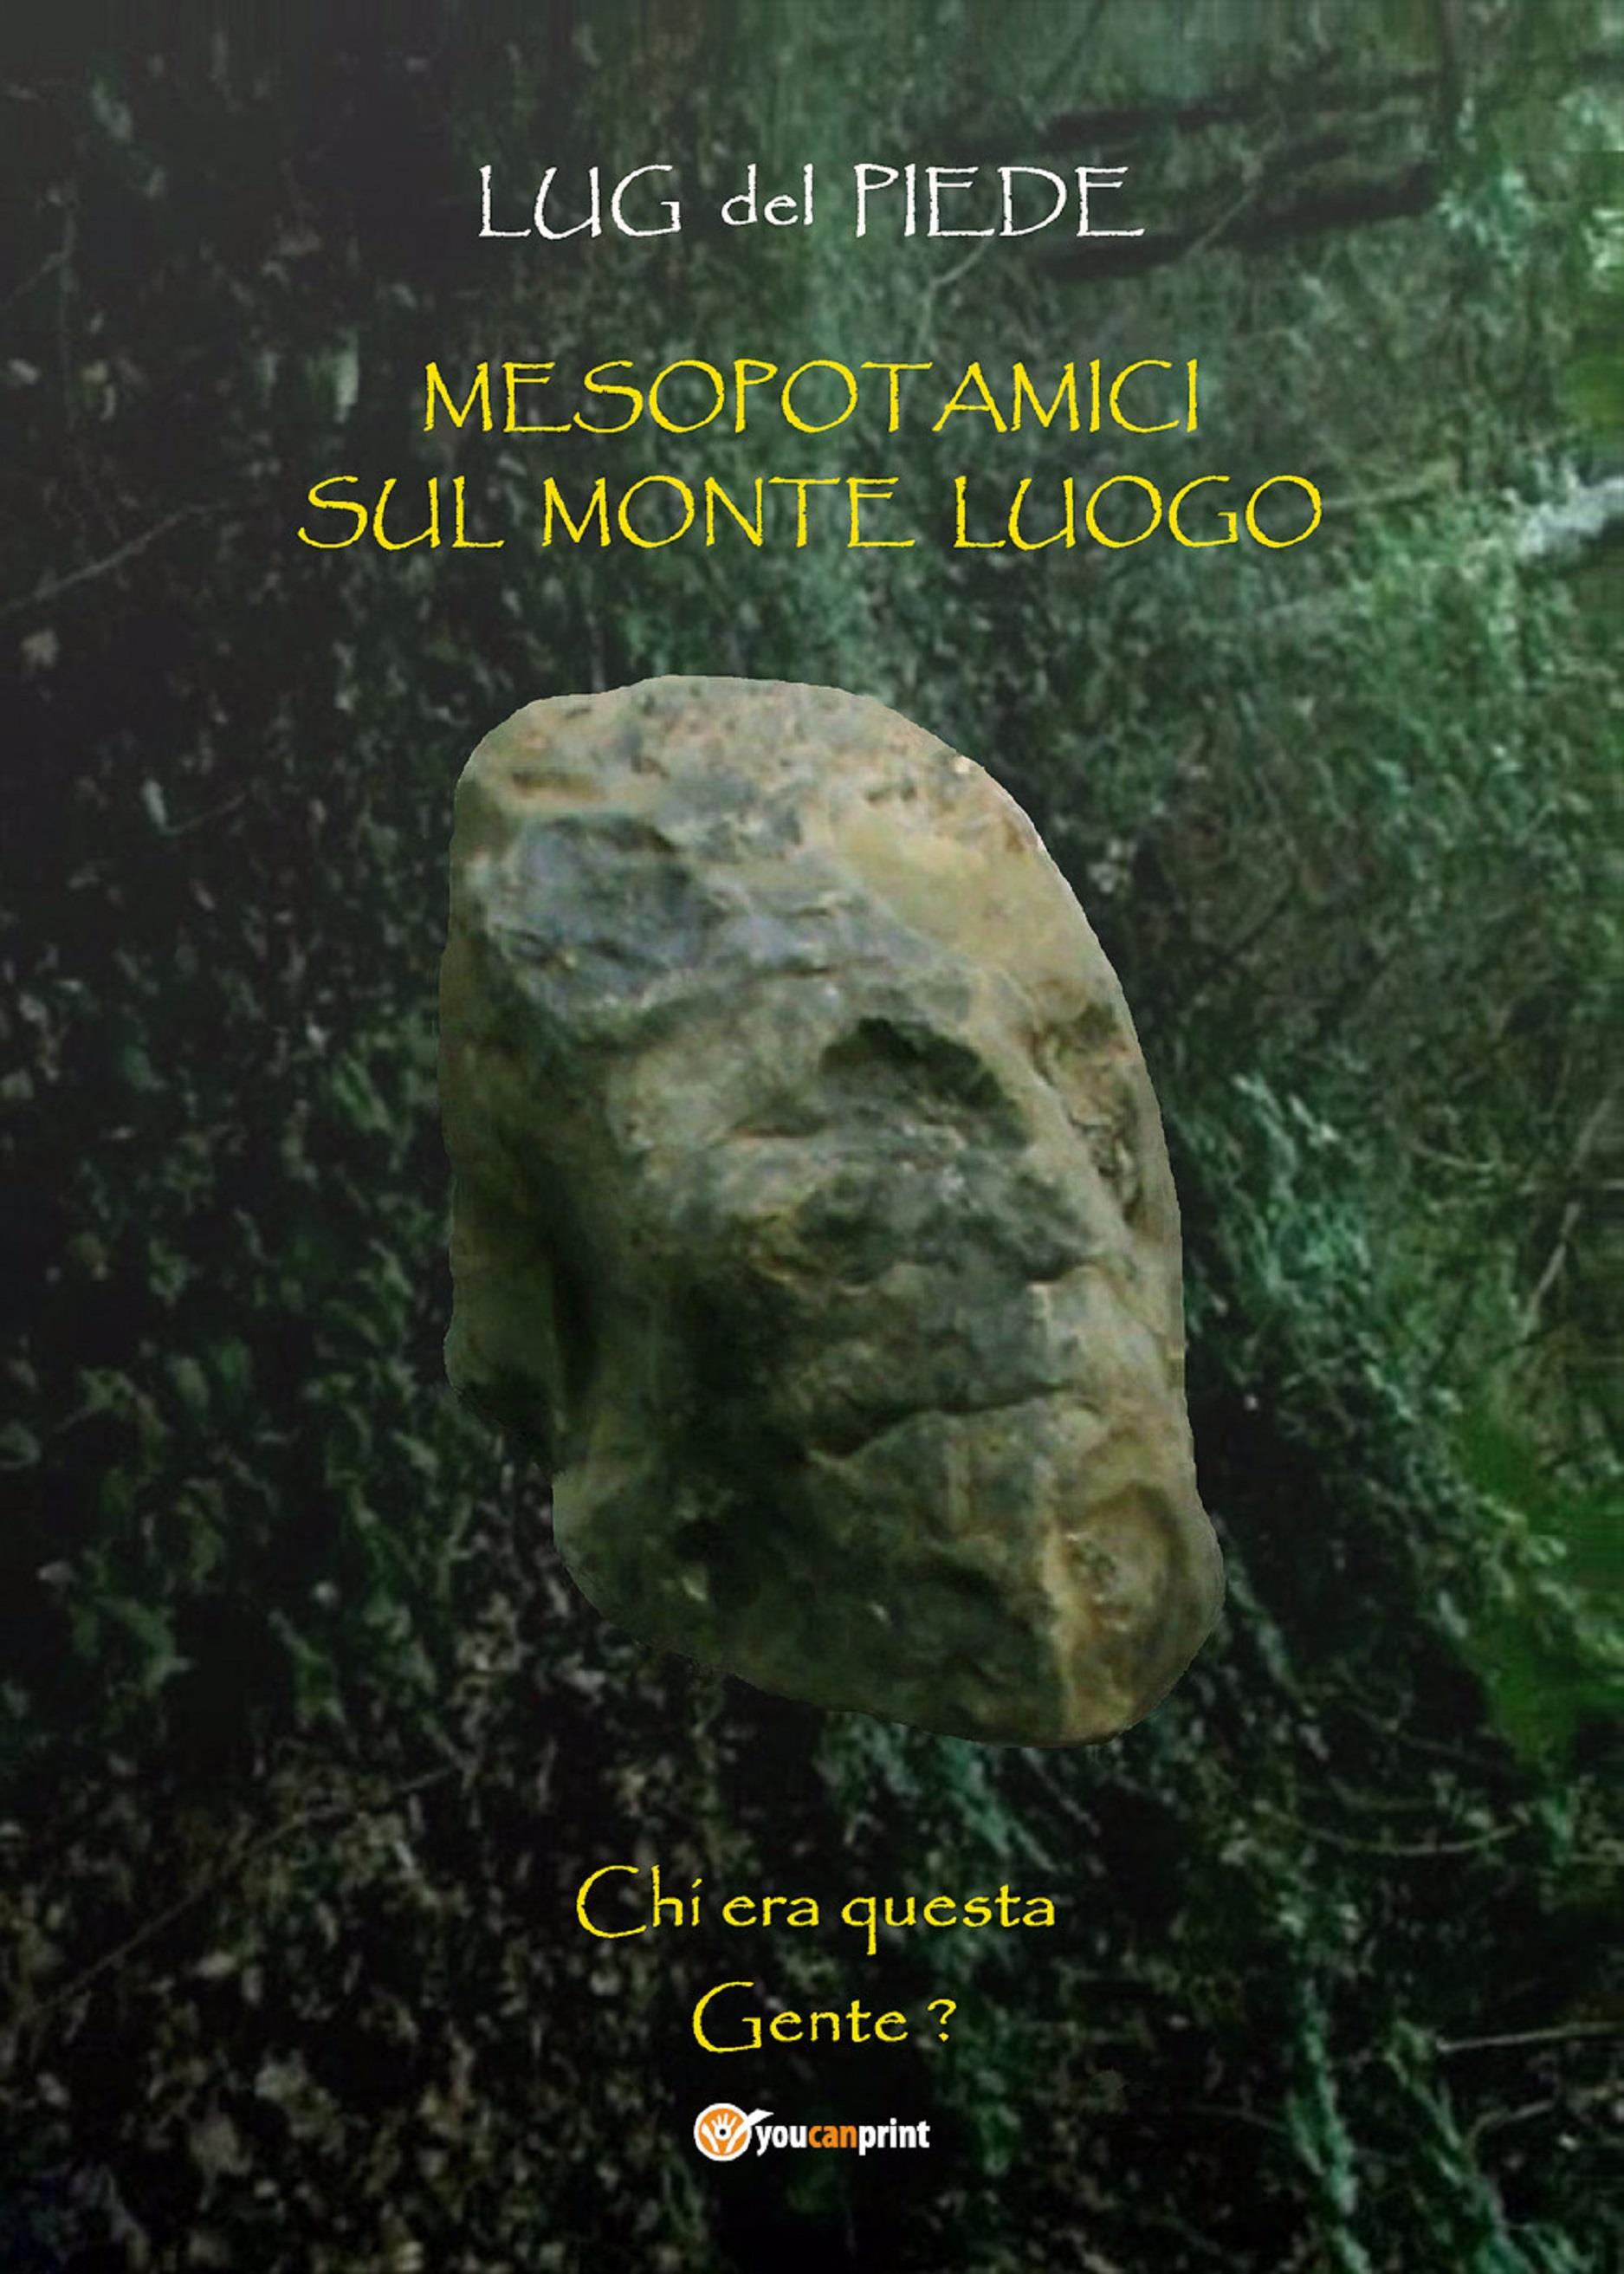 Mesopotamici sul monte luogo